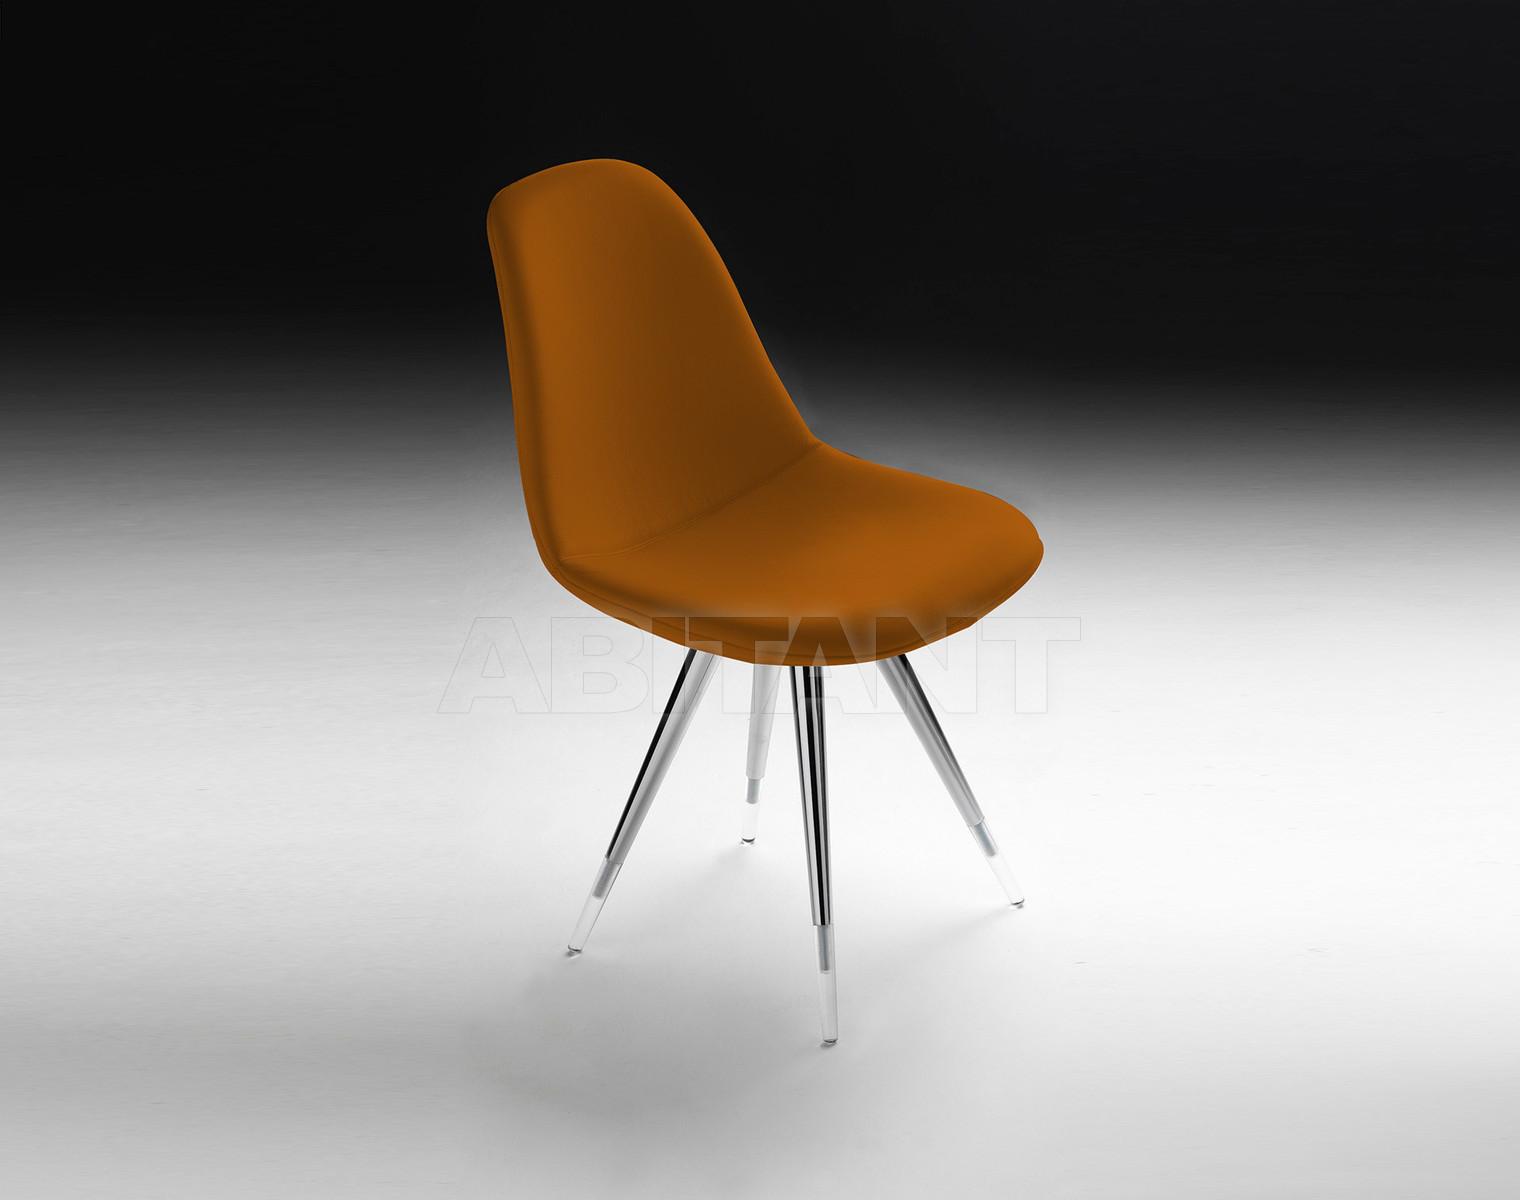 Купить Стул Kubikoff Gino Lemson & Ruud Bos Angel'POP'Chair' 03